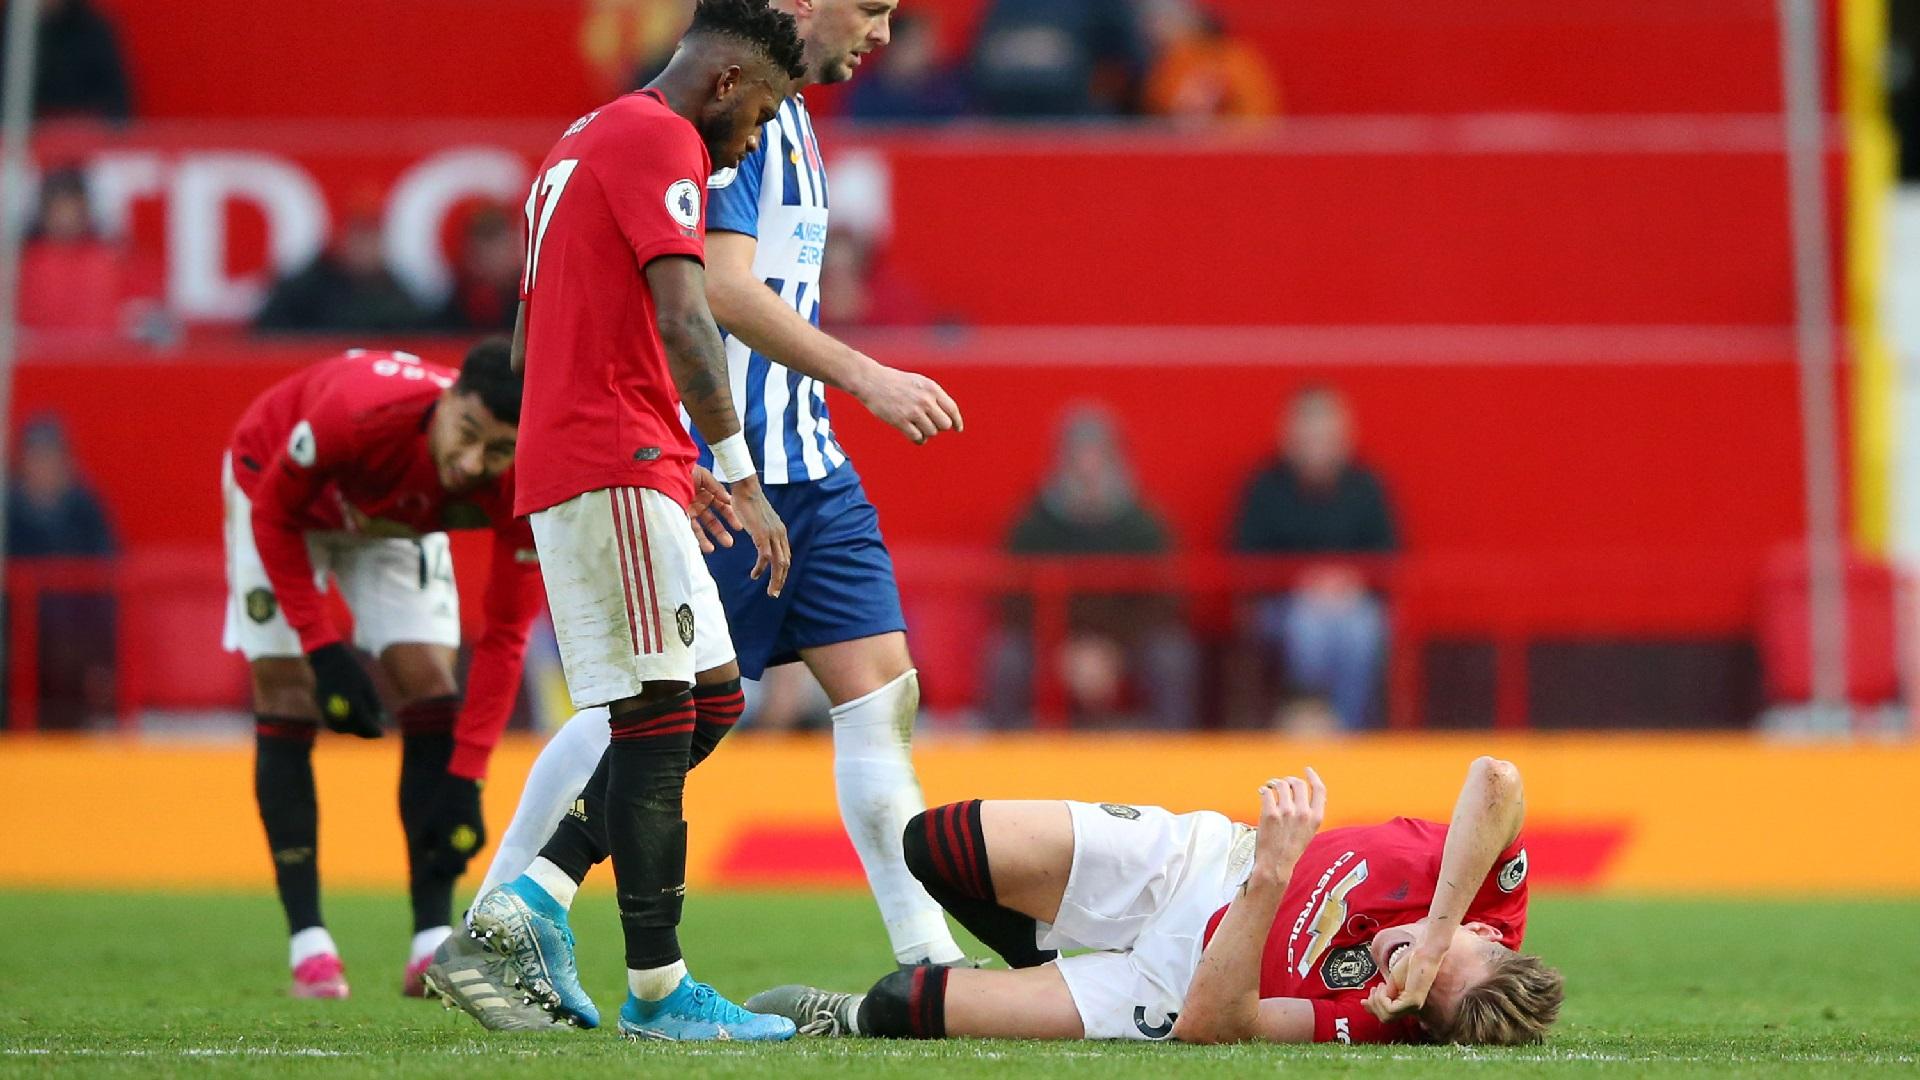 McTominay injury mars Man Utd win over Brighton as midfielder hobbles off